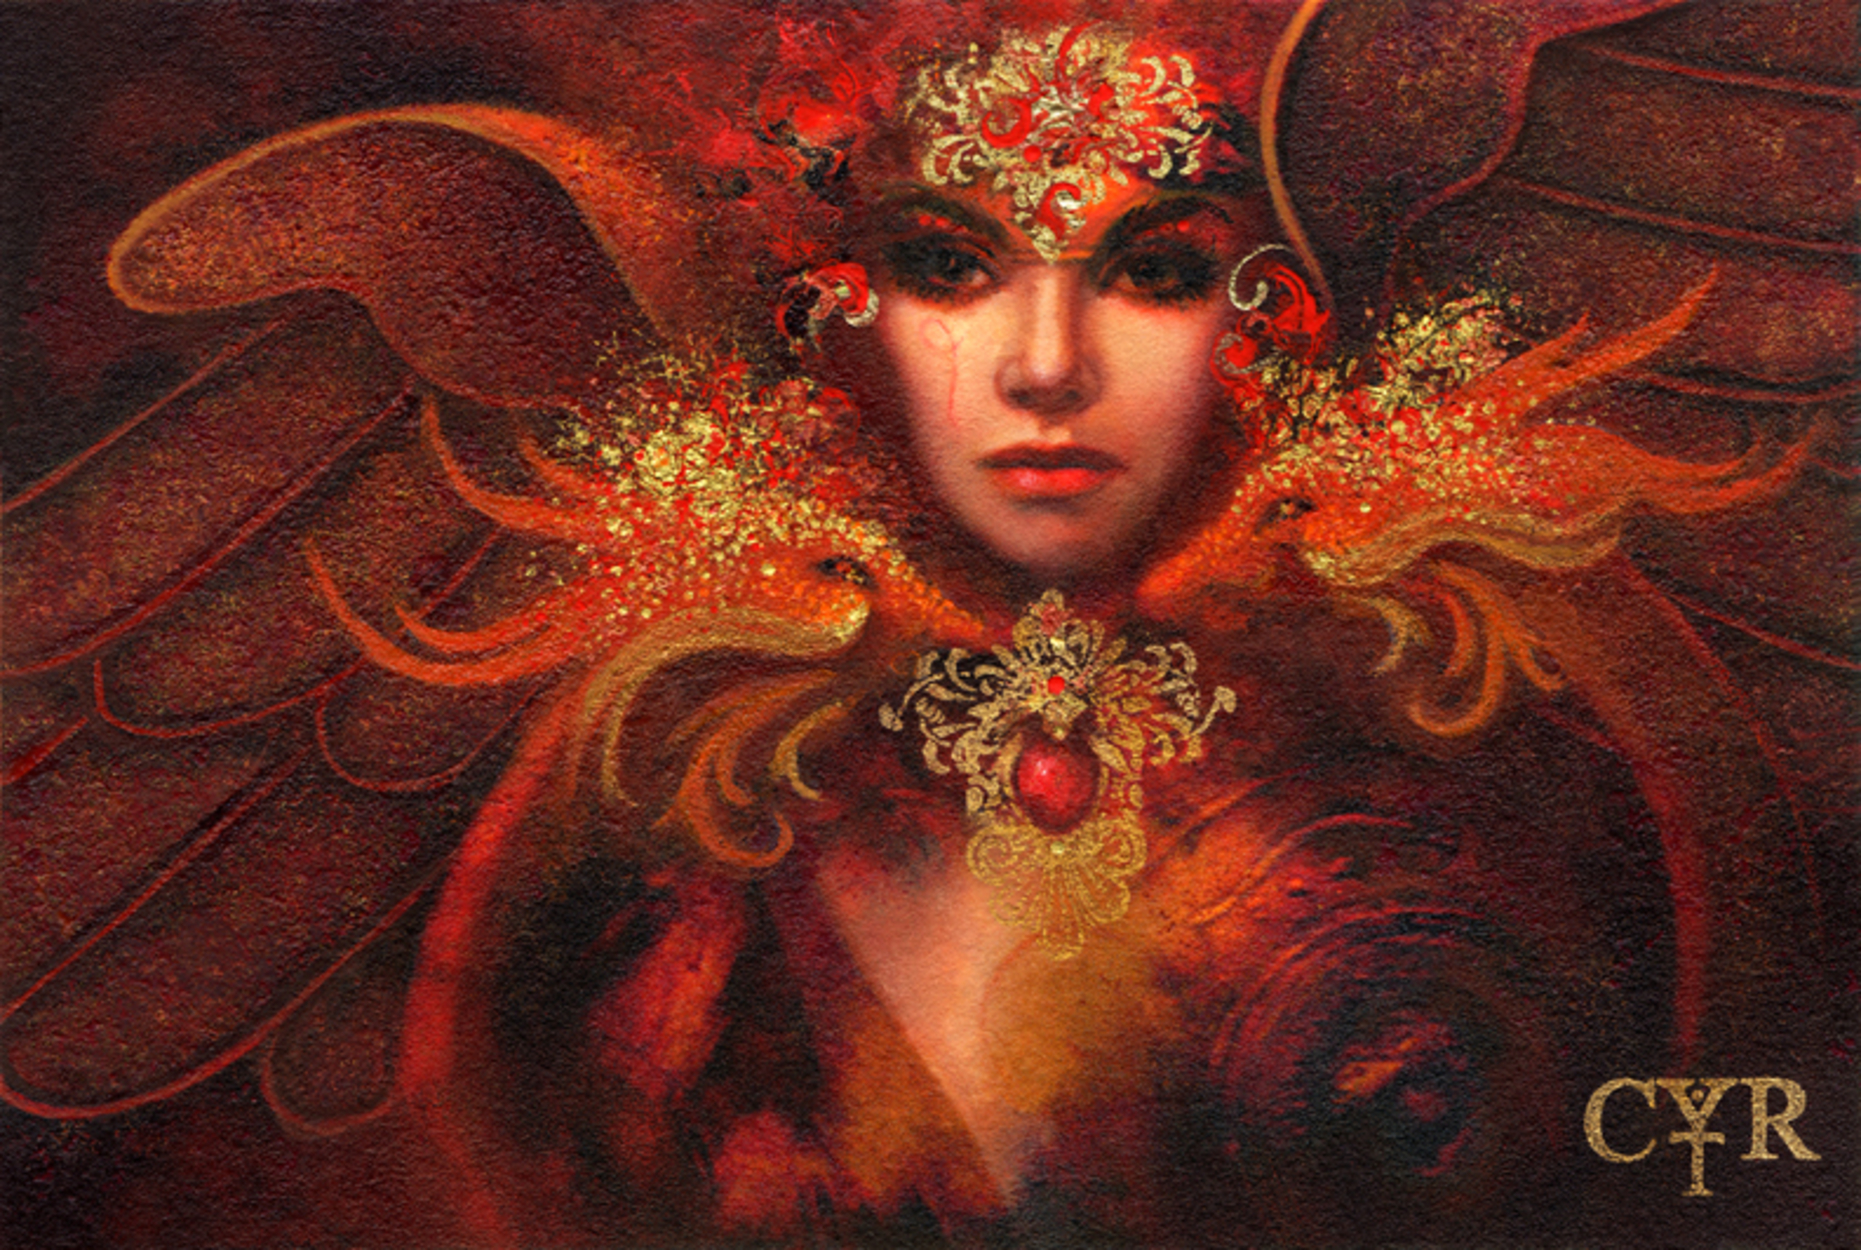 Through the Fire Artwork by Lisa L. Cyr